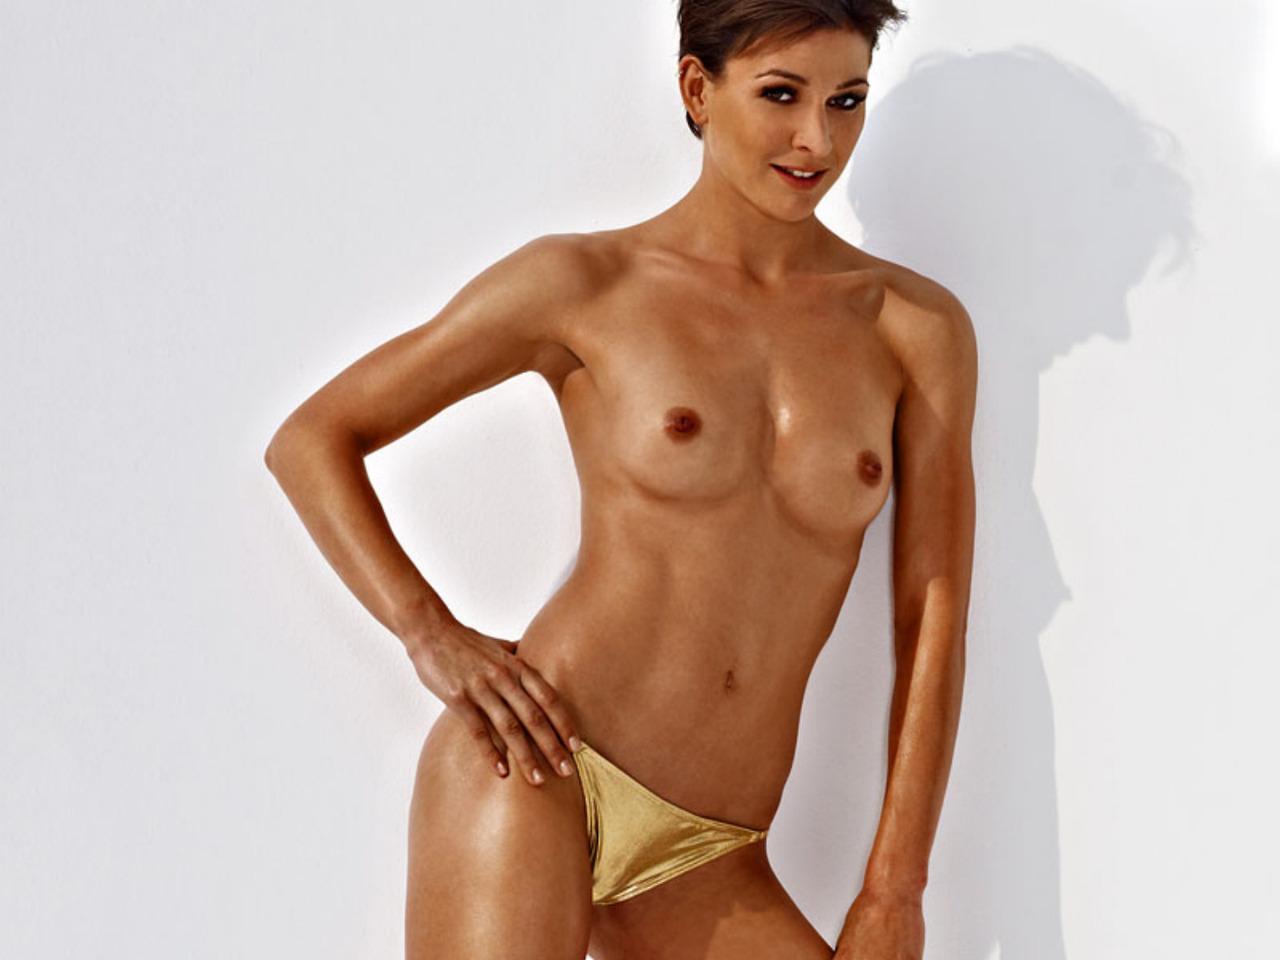 female celebrity nudes